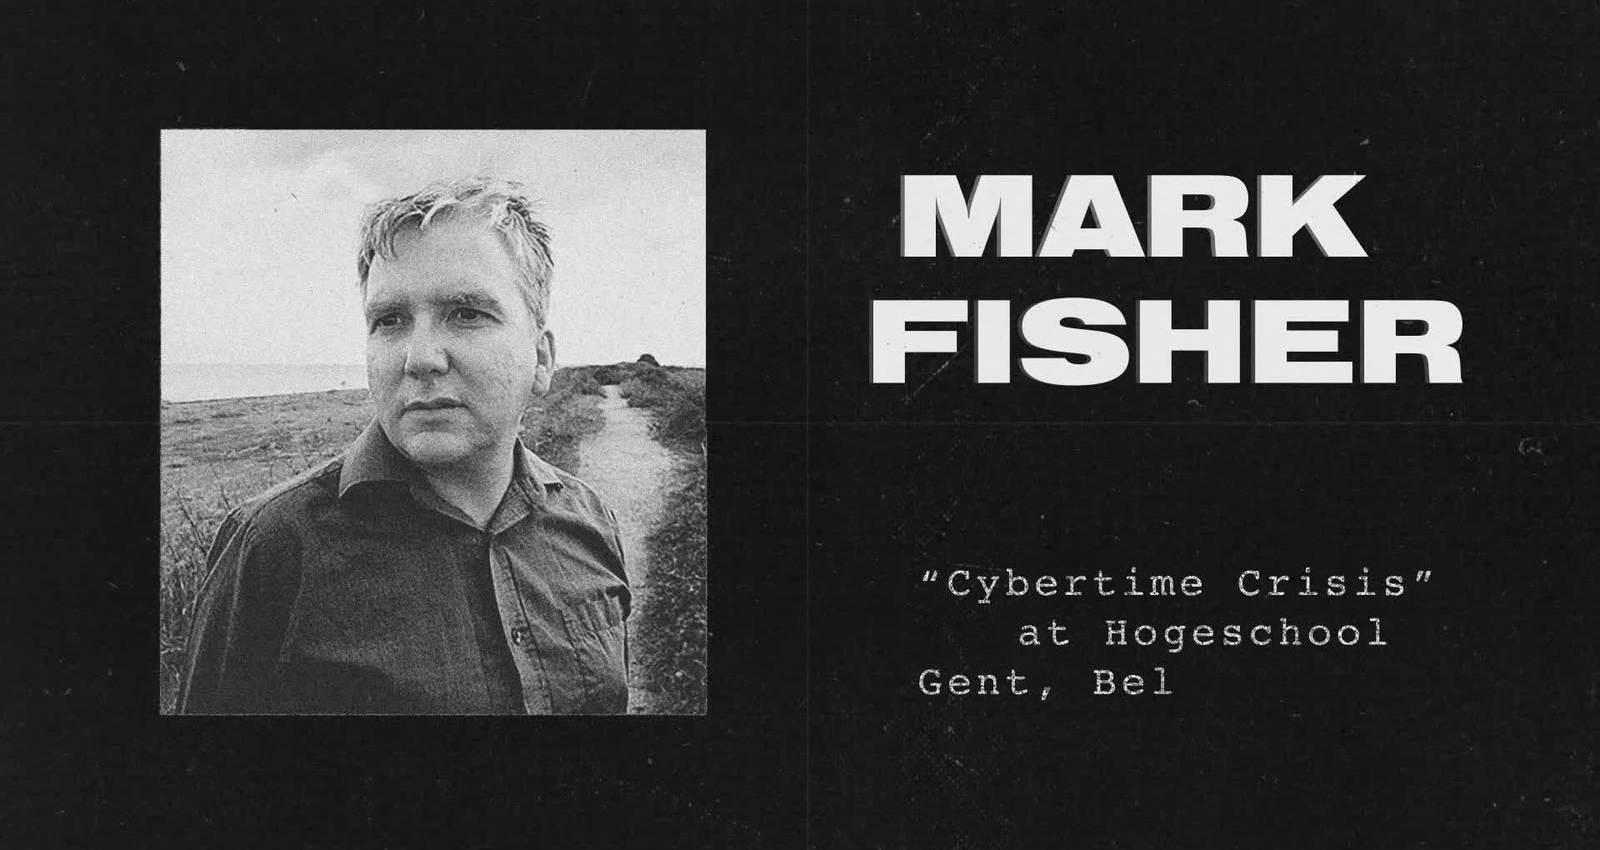 Mark Fisher: Cybertime Crisis